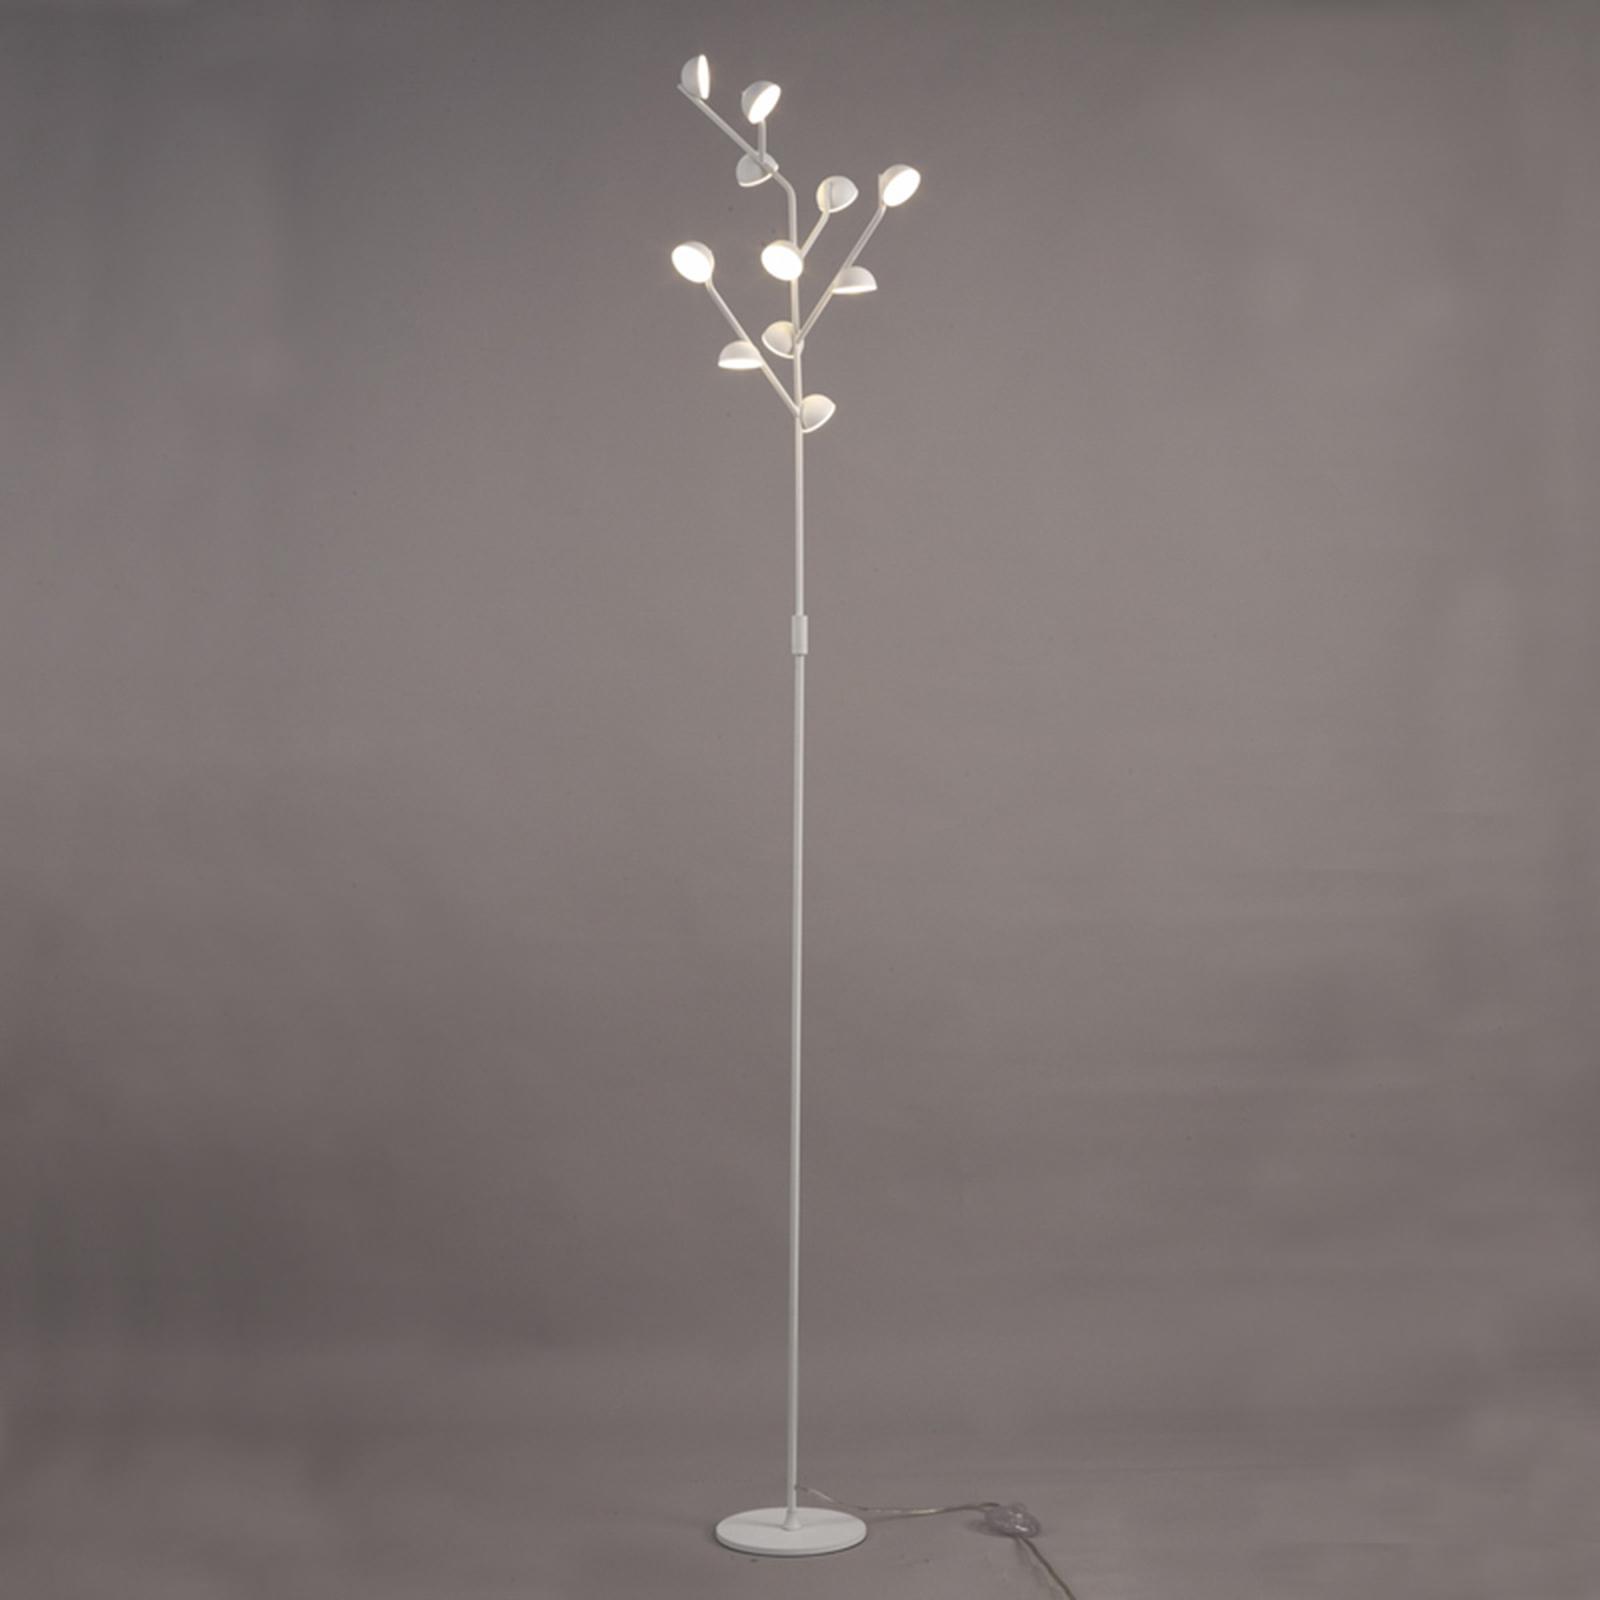 Lampa stojąca LED Adn